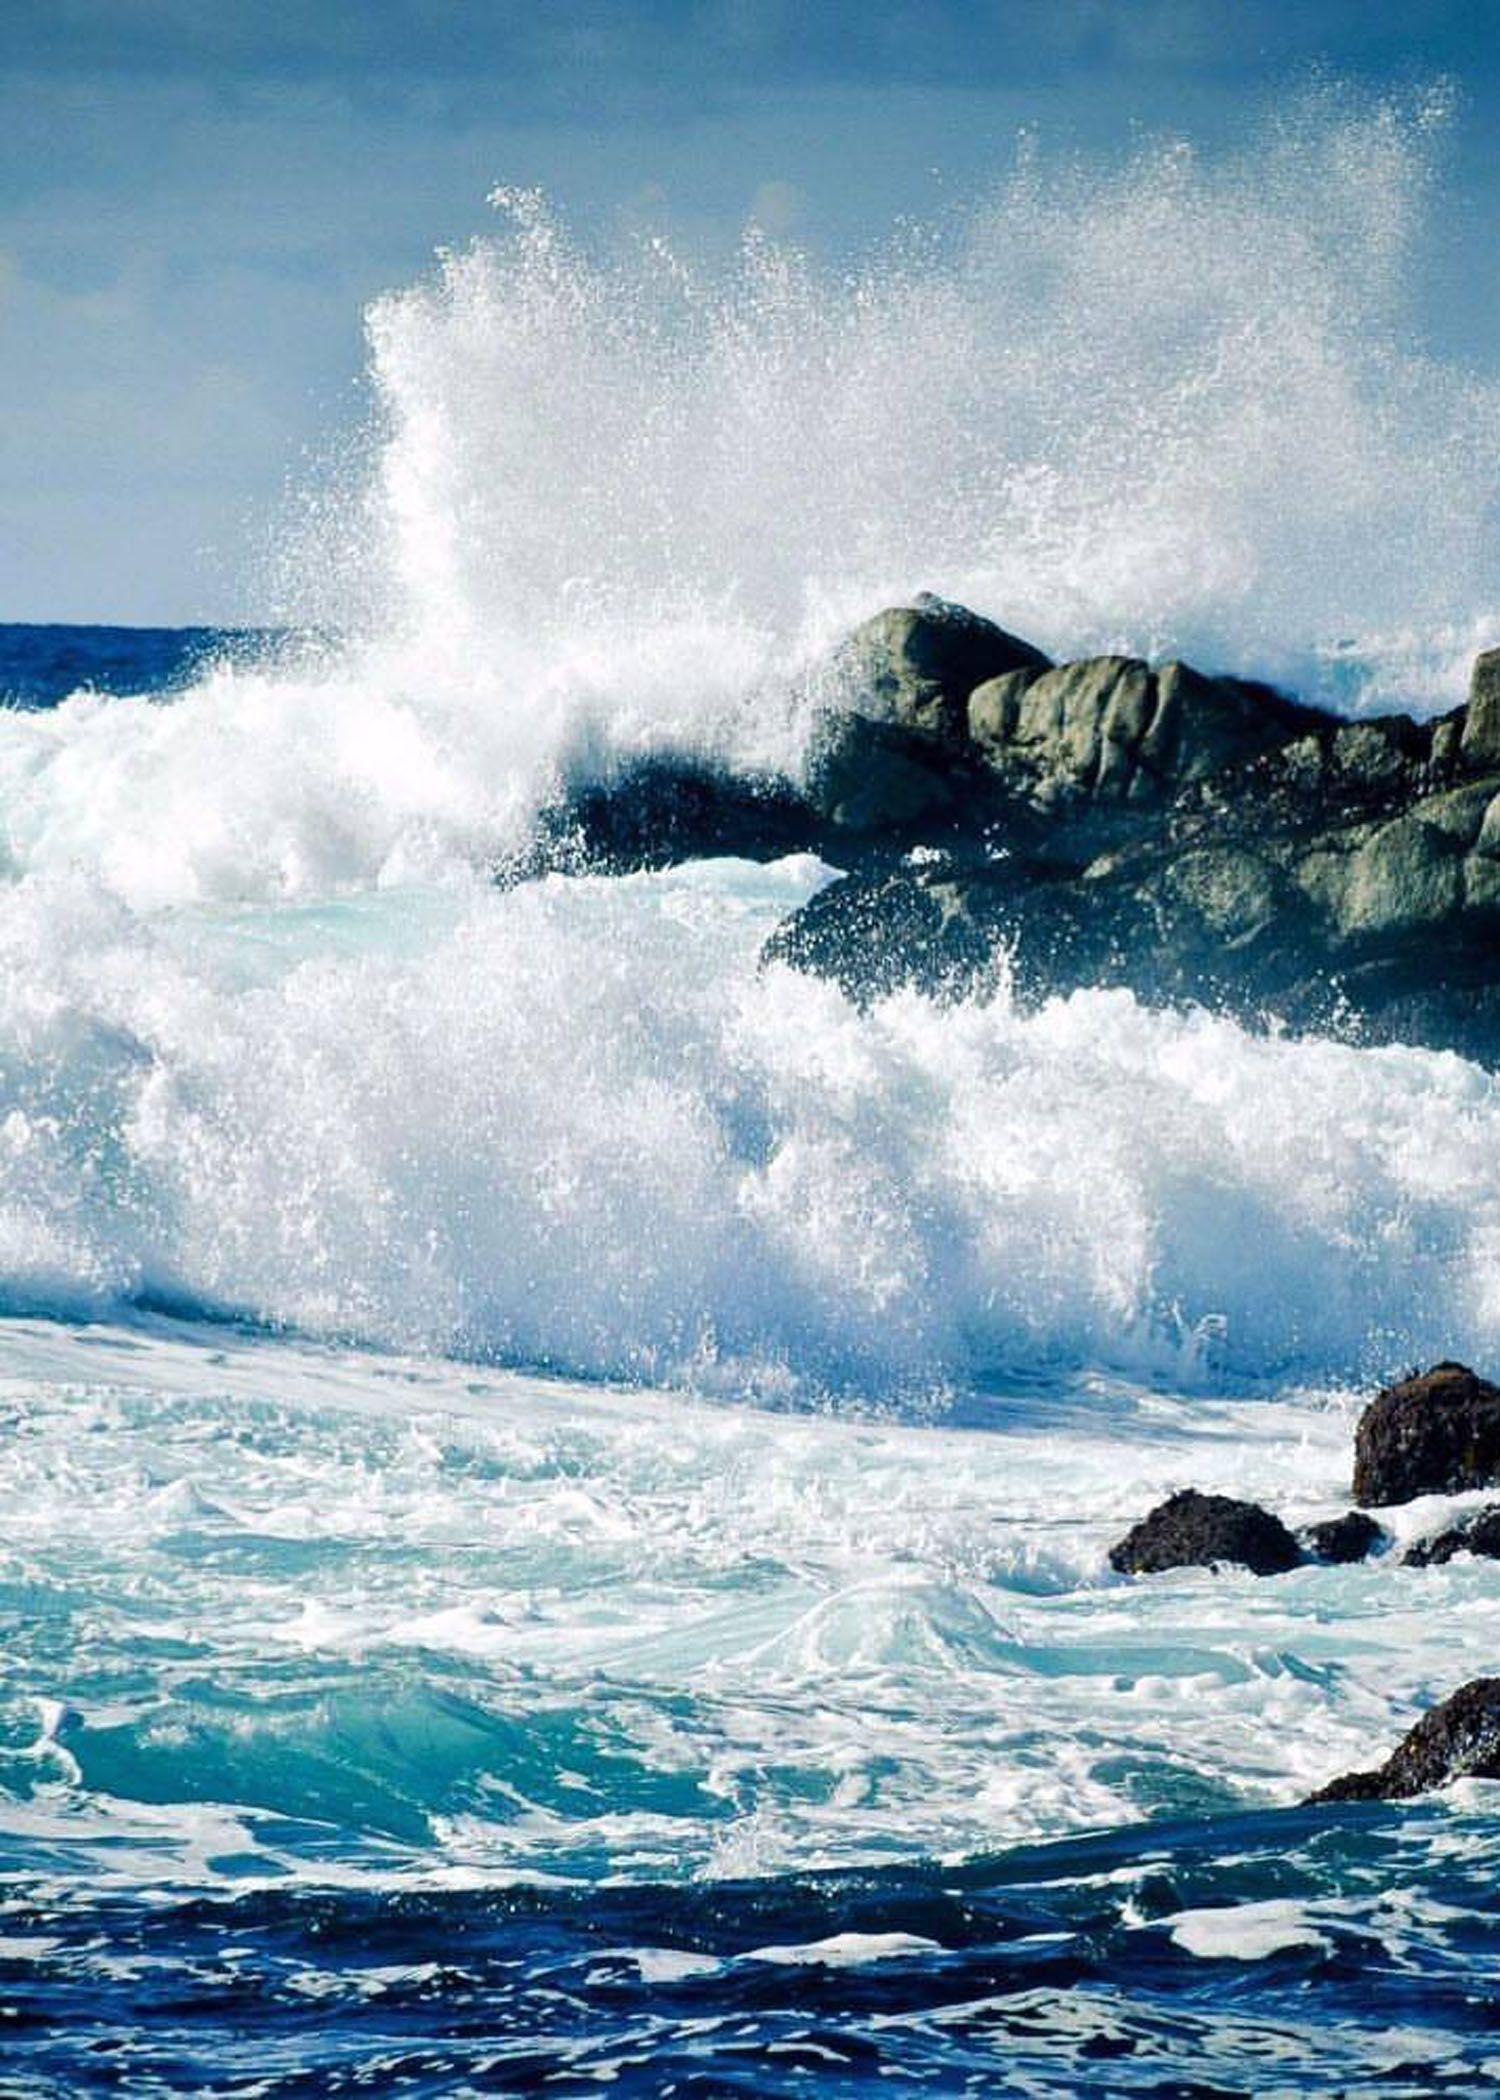 Unstoppable Power Ibizaposidonia Mediterranean Sea Natural Beauty Hermosa Naturaleza Olas De Mar Paisajes